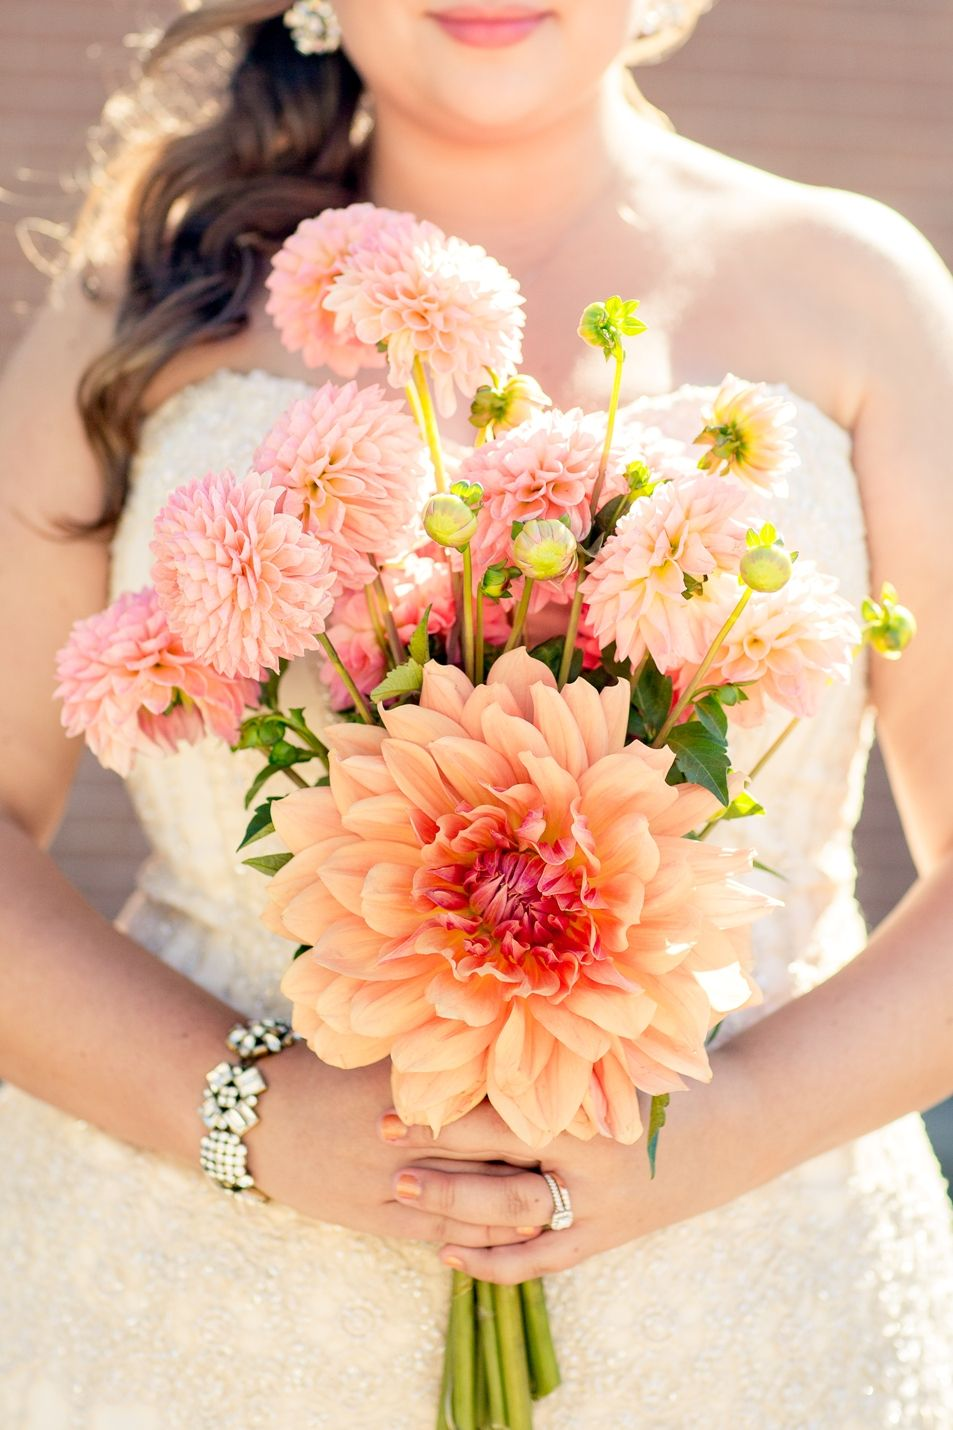 Orange peach and coral dahlias : wedding bouquet   Photo by Mindy Strauss Photography www.mindystrauss.com